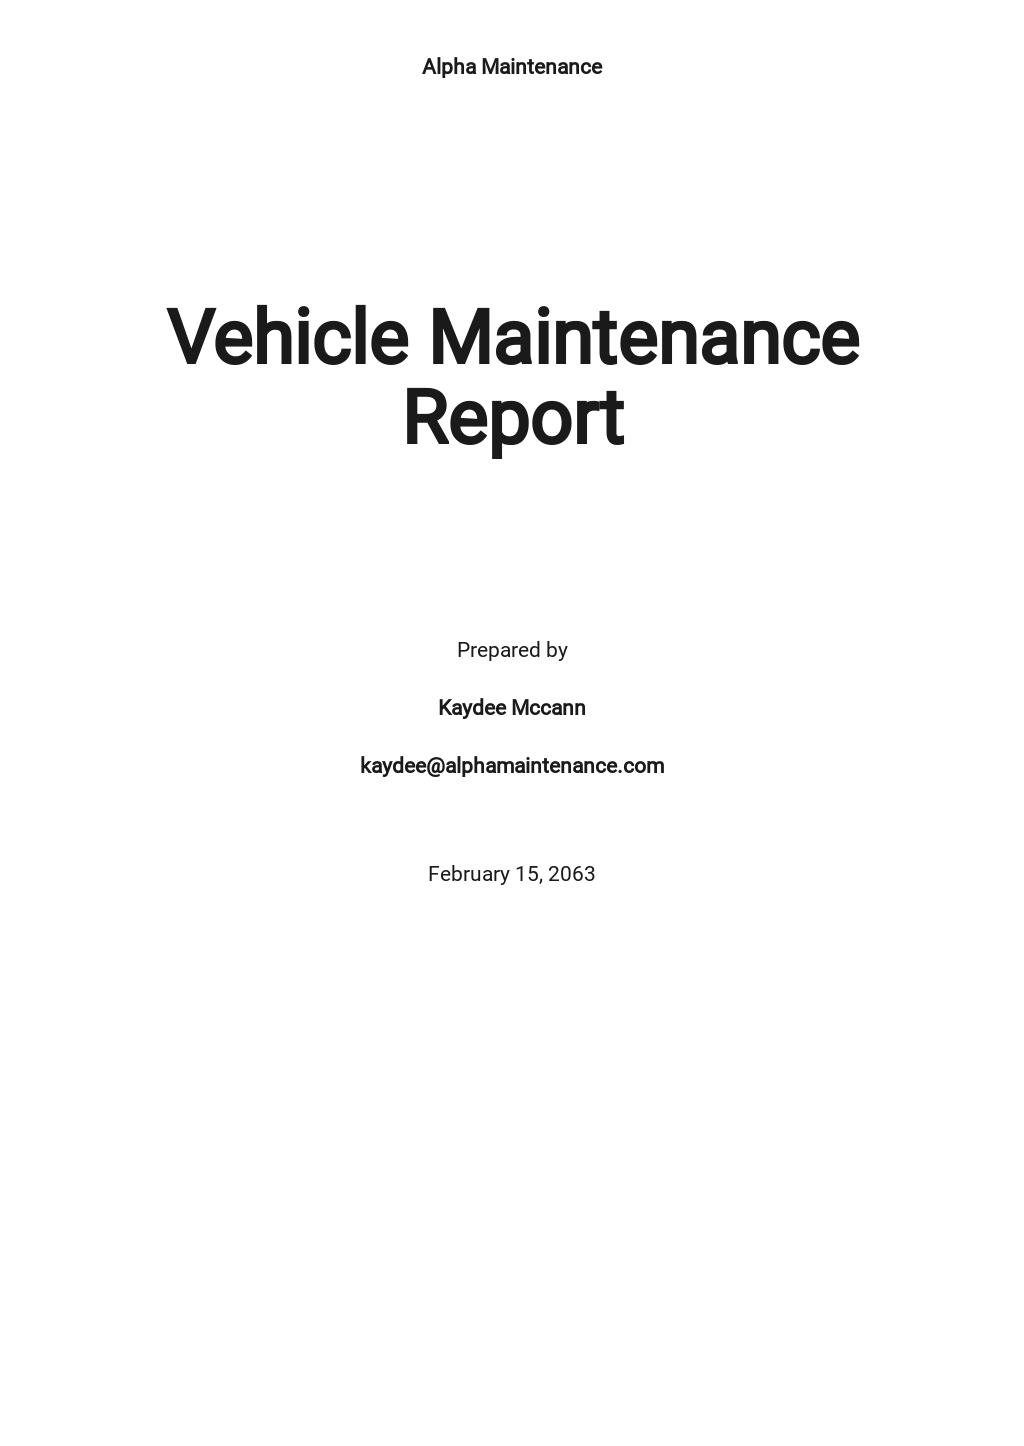 Vehicle Maintenance Report Template.jpe